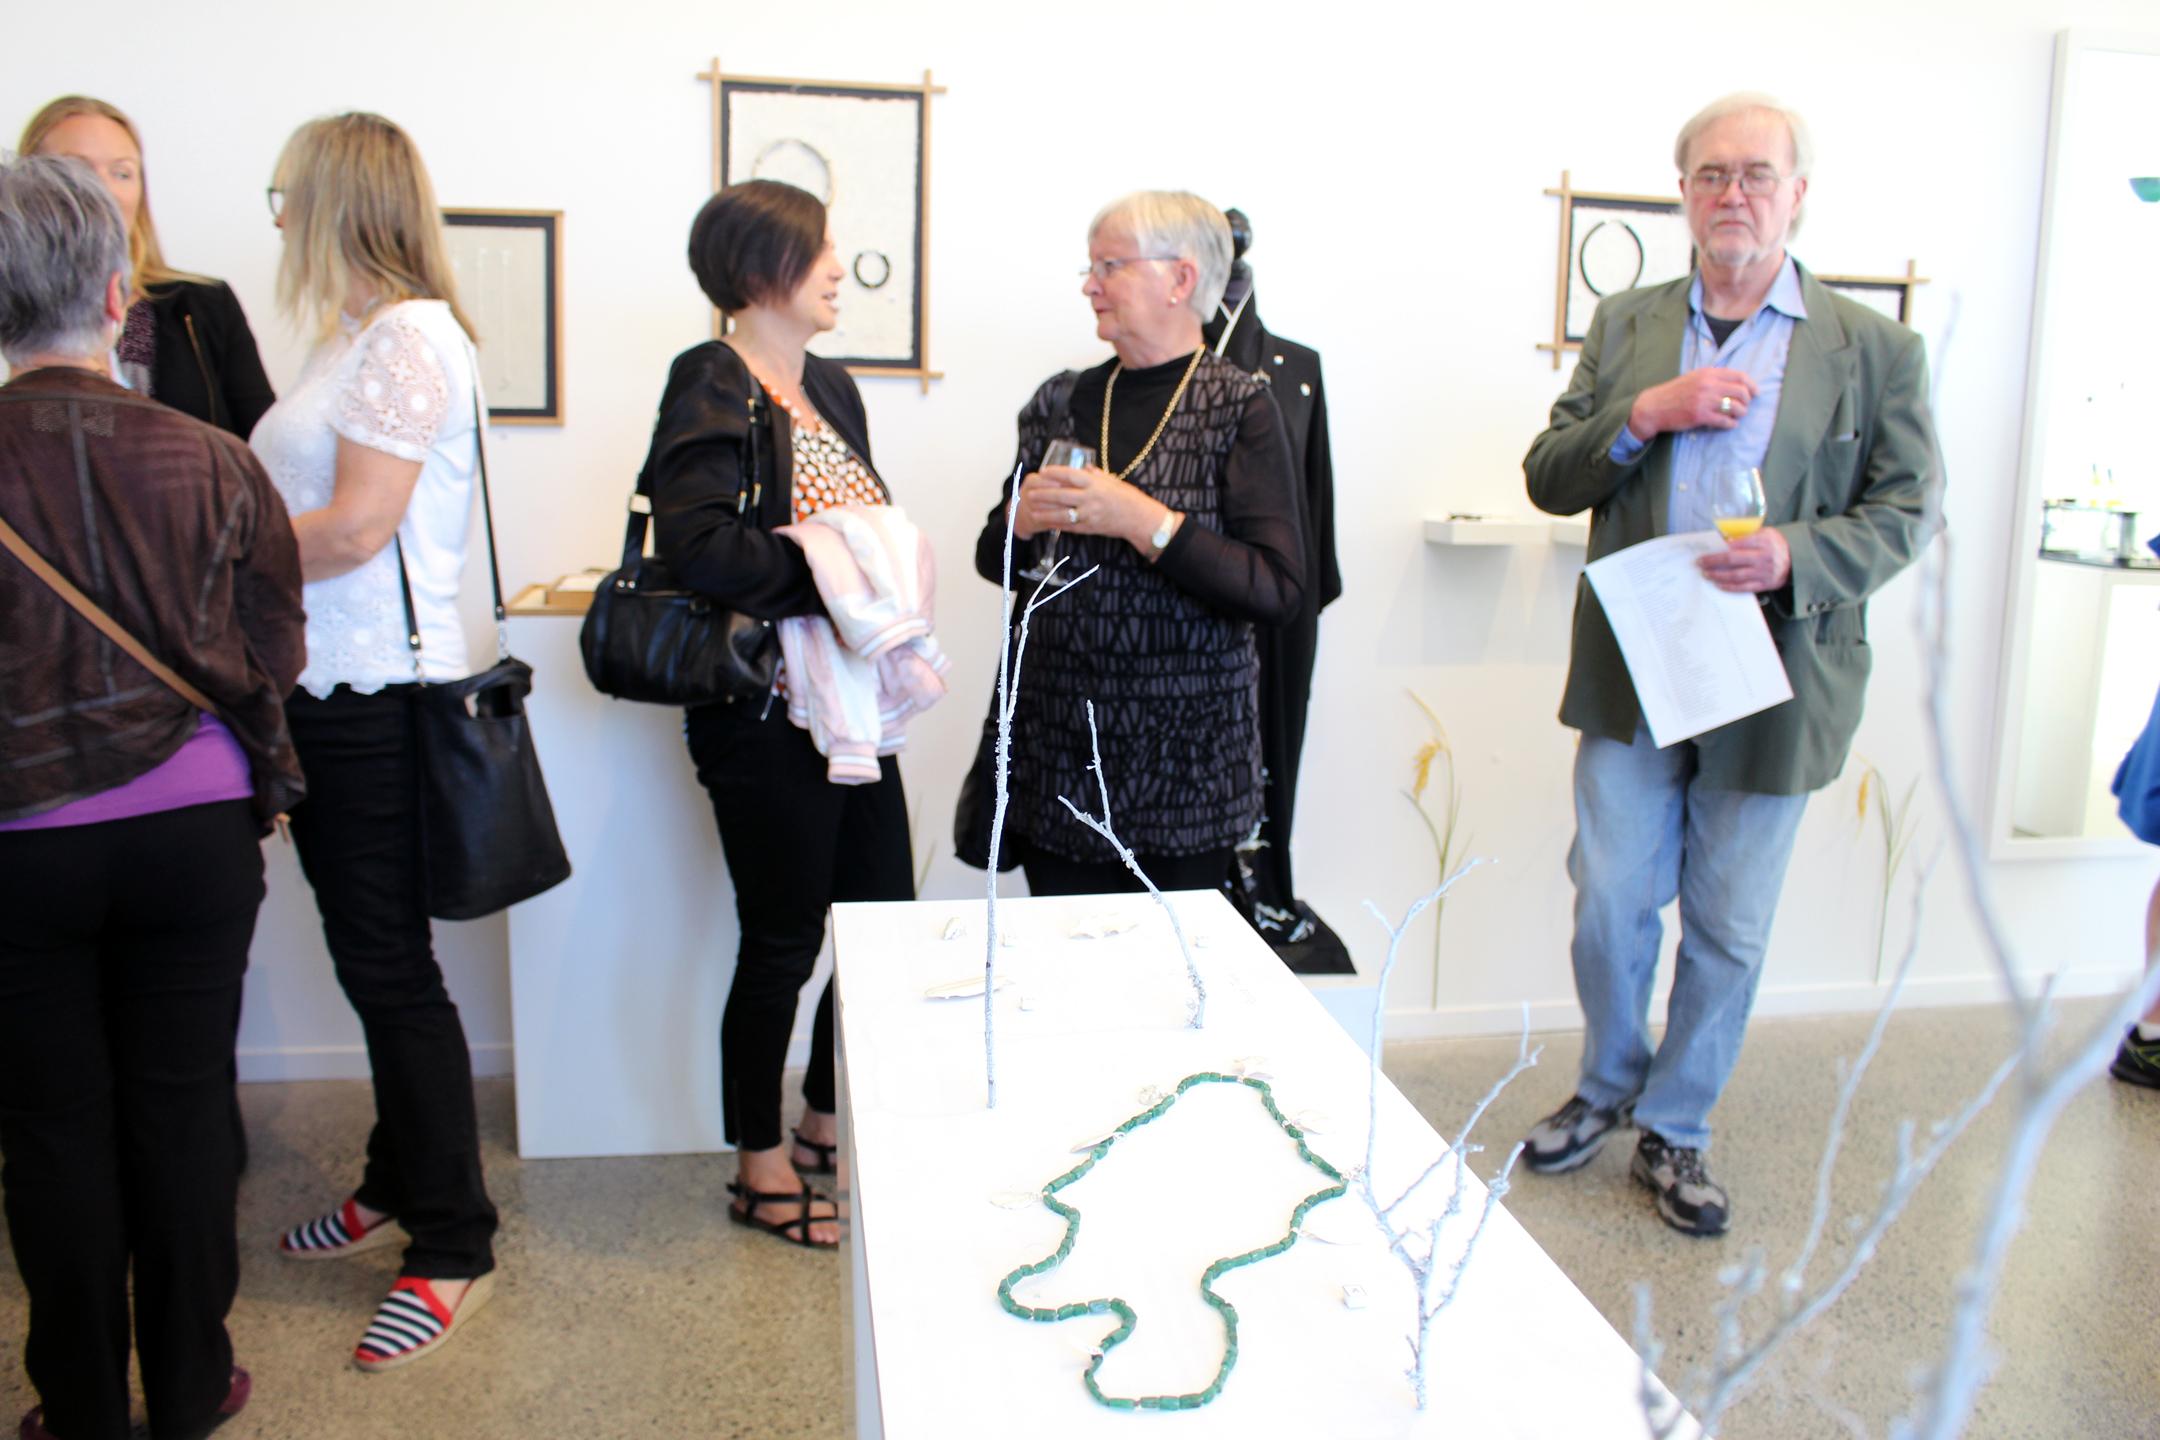 exhibition_opening_4.jpg